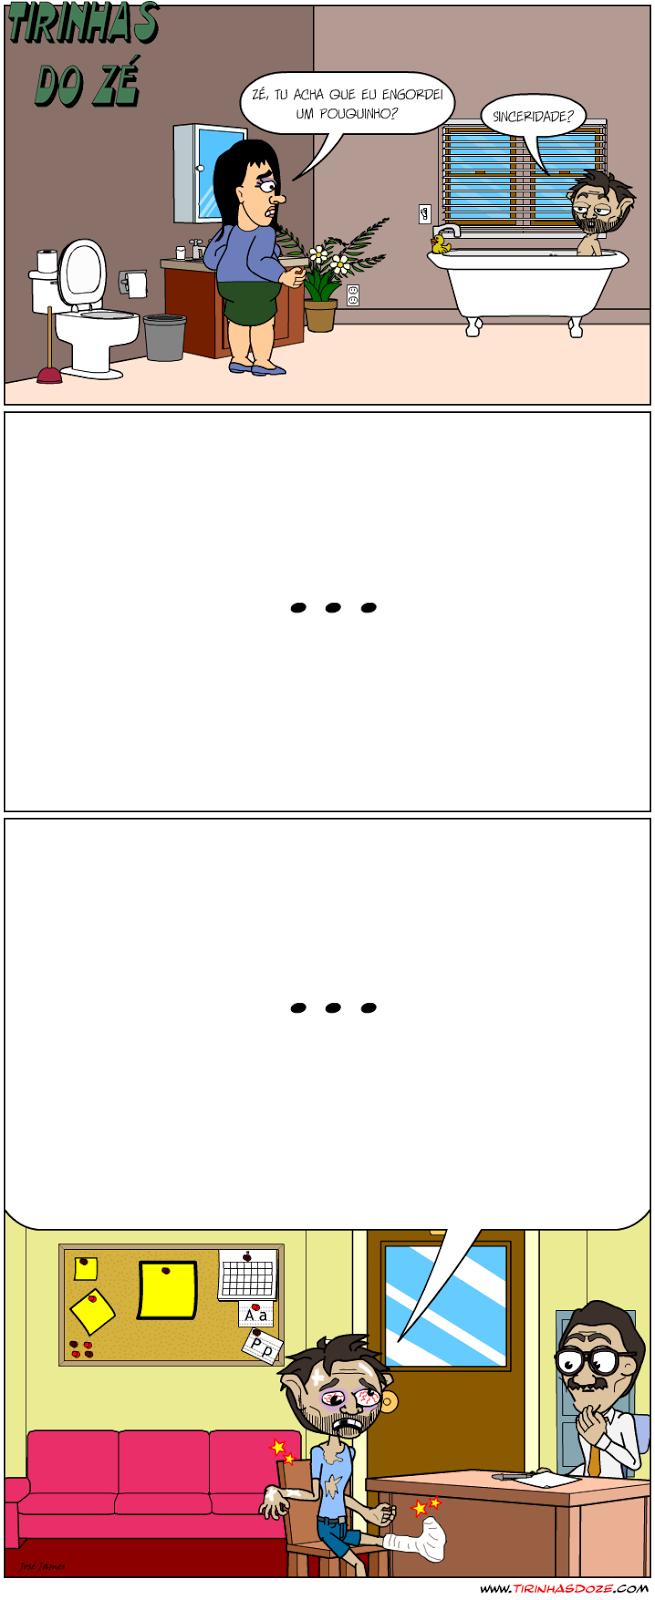 Sincero.png (655×1600)